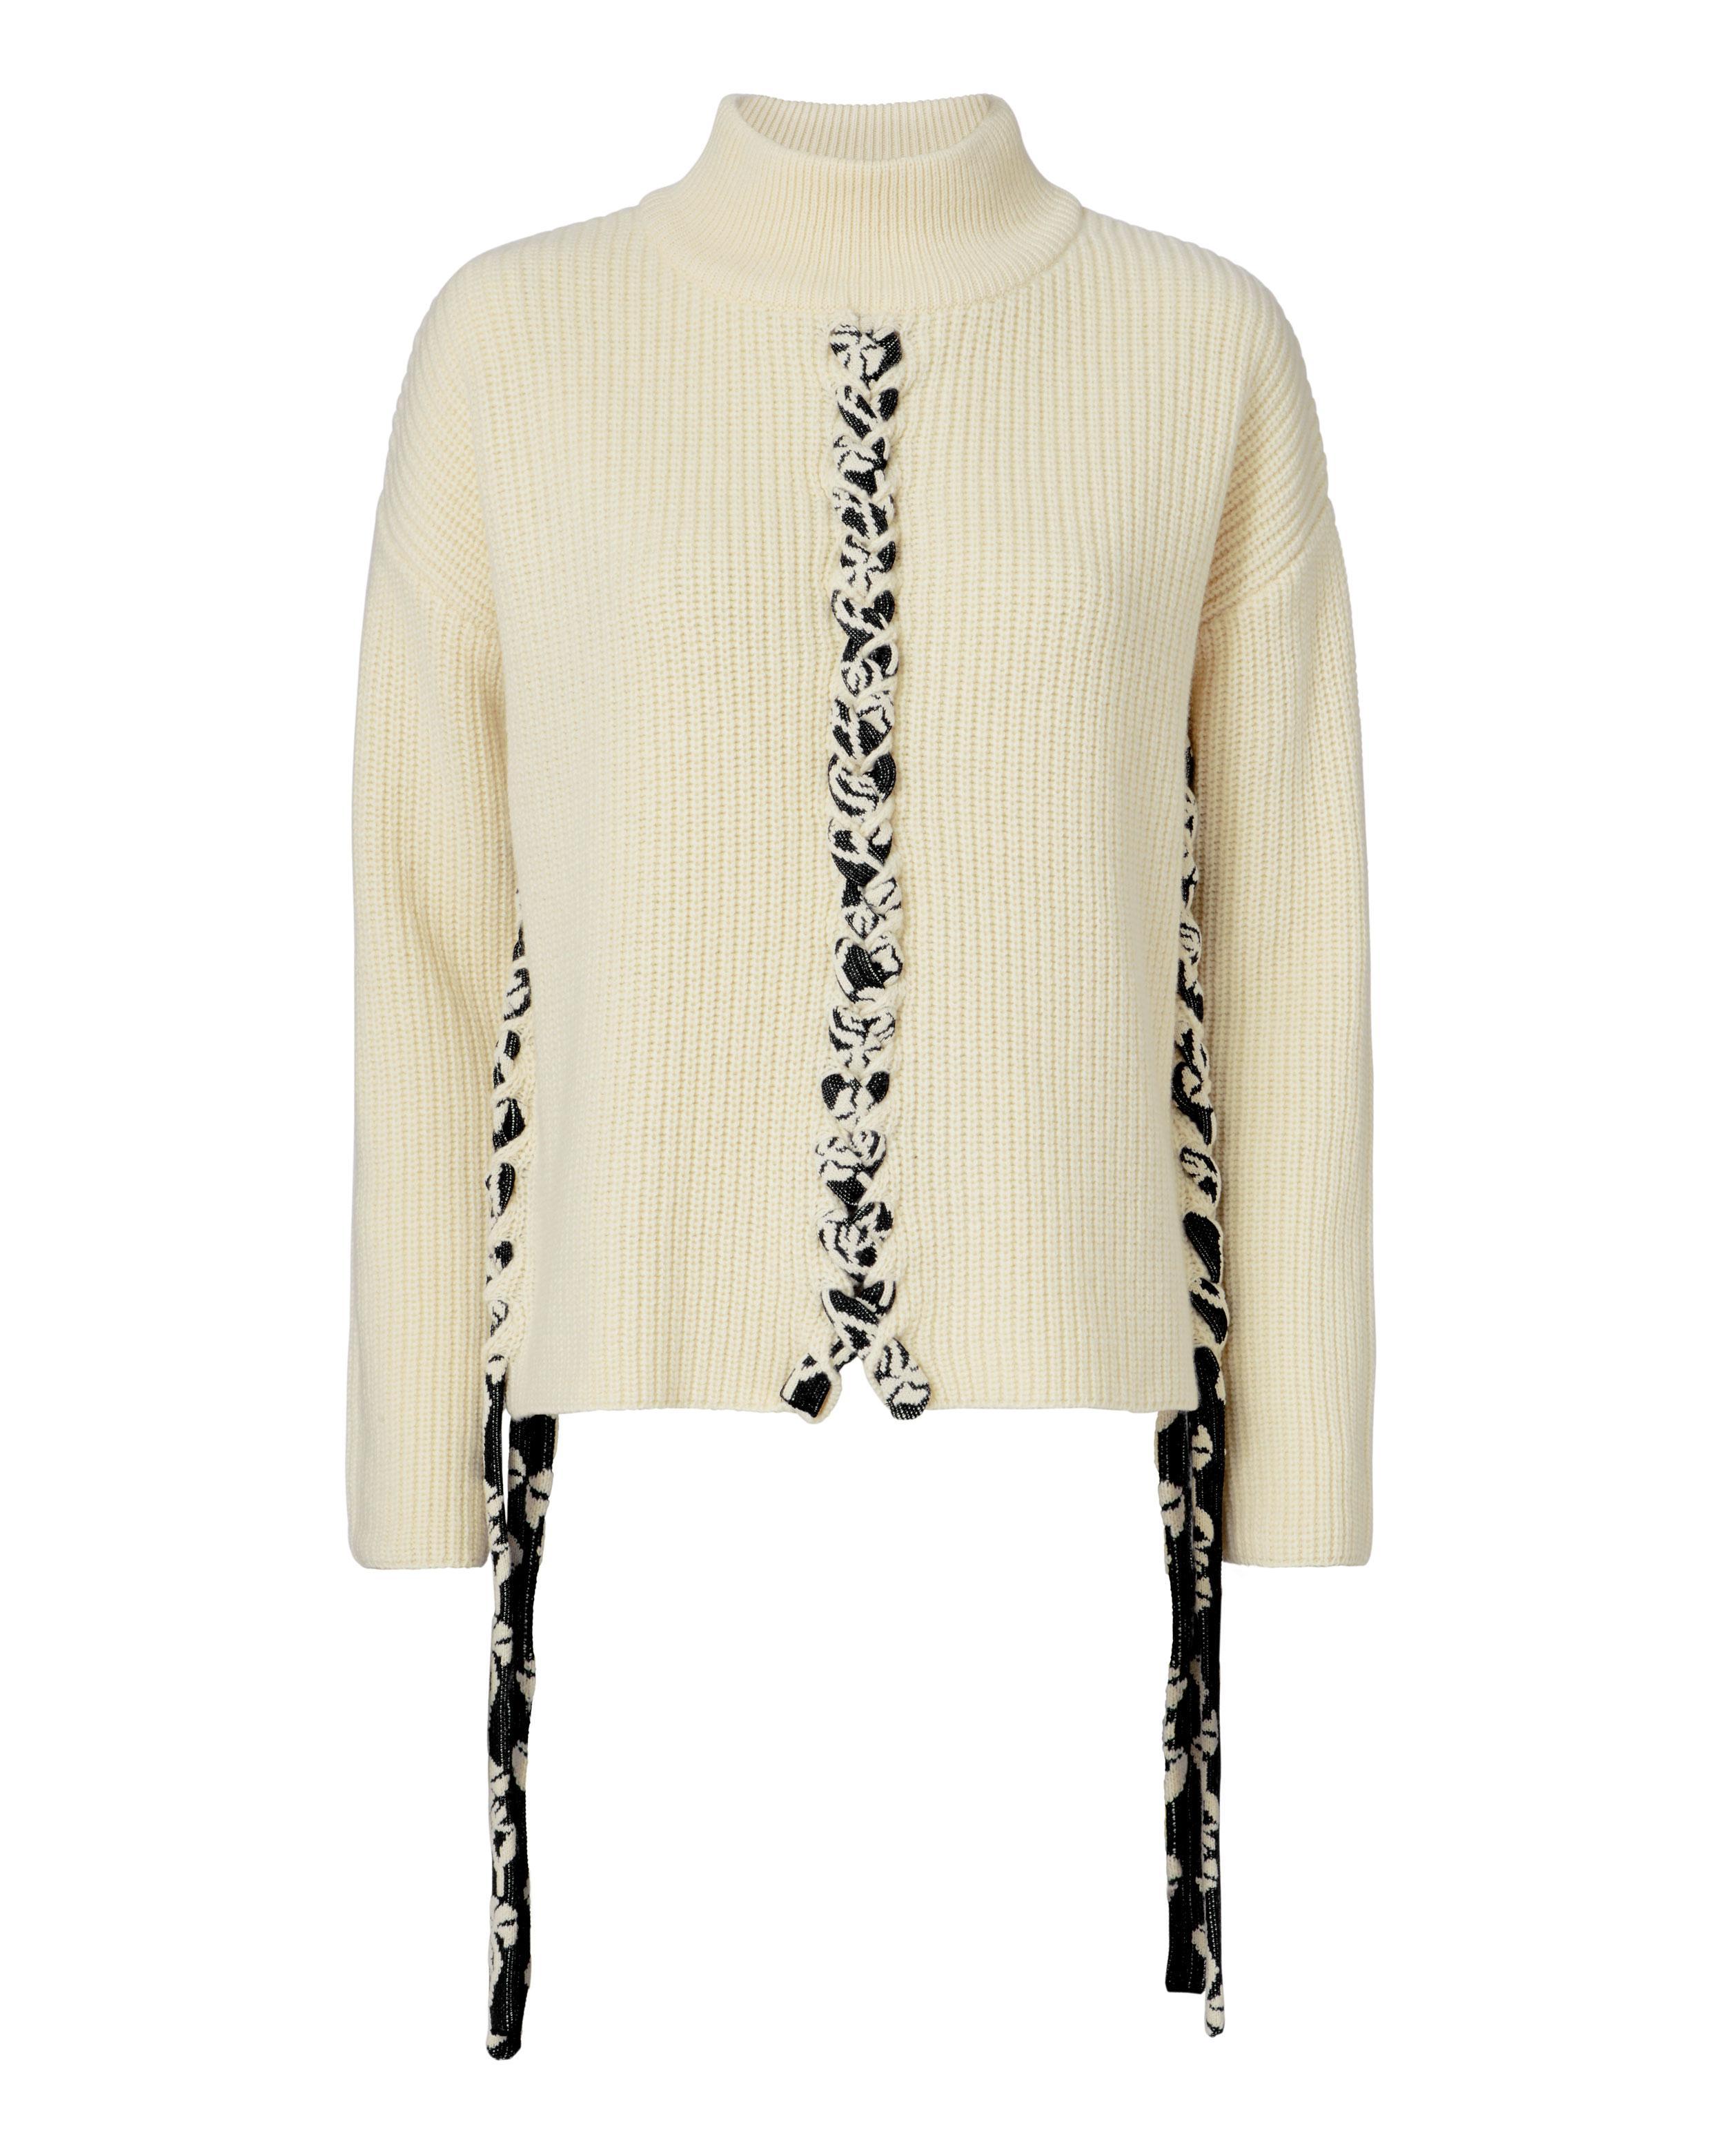 Tabula Rasa Rani One-Shoulder Sweater w/ Tags Free Shipping Cheap Real Manchester Great Sale Cheap Price JmeLDG